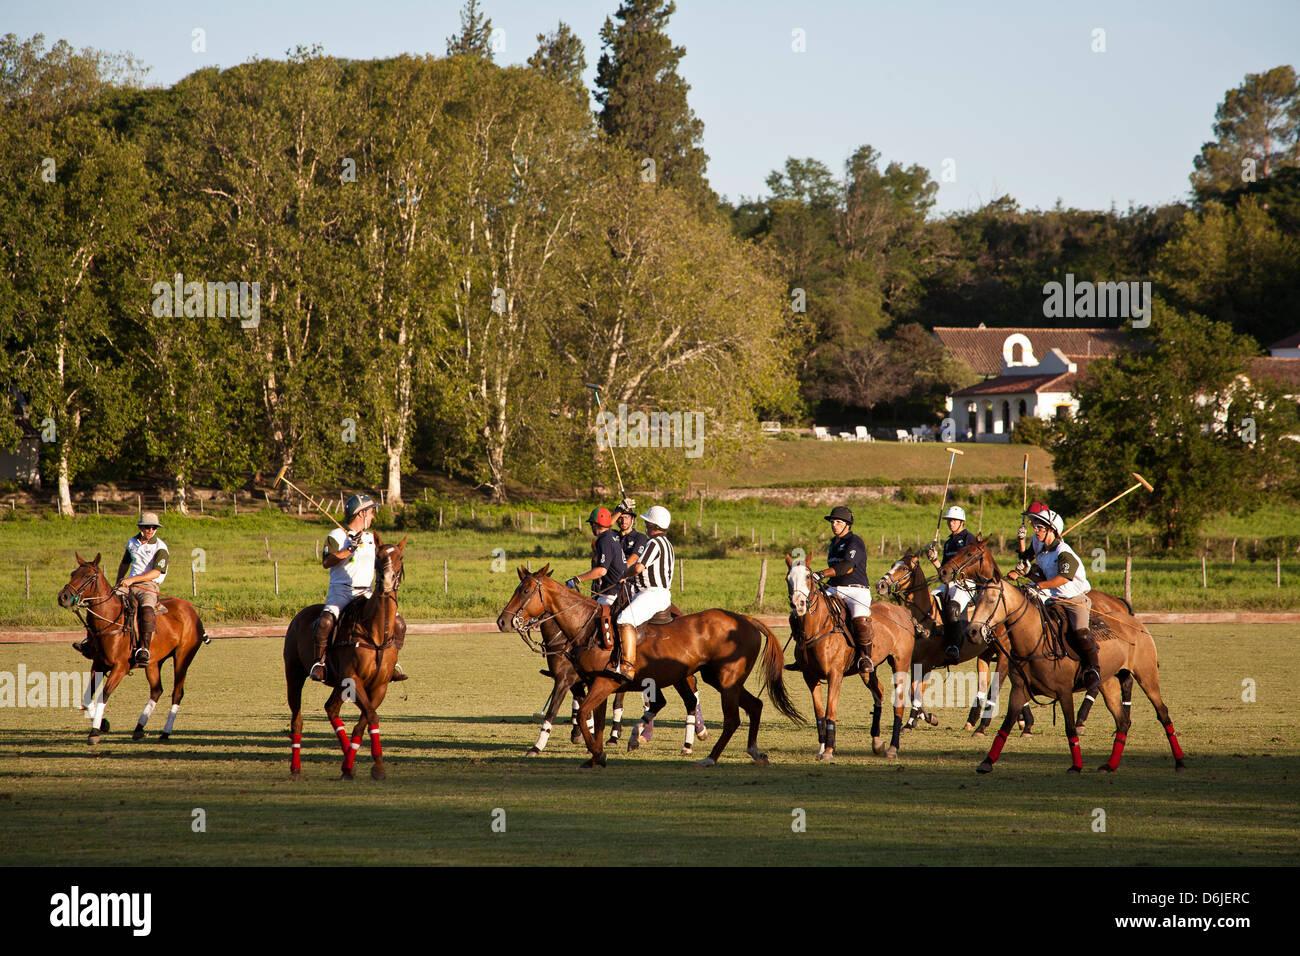 Polo game, Cordoba Province, Argentina, South America - Stock Image